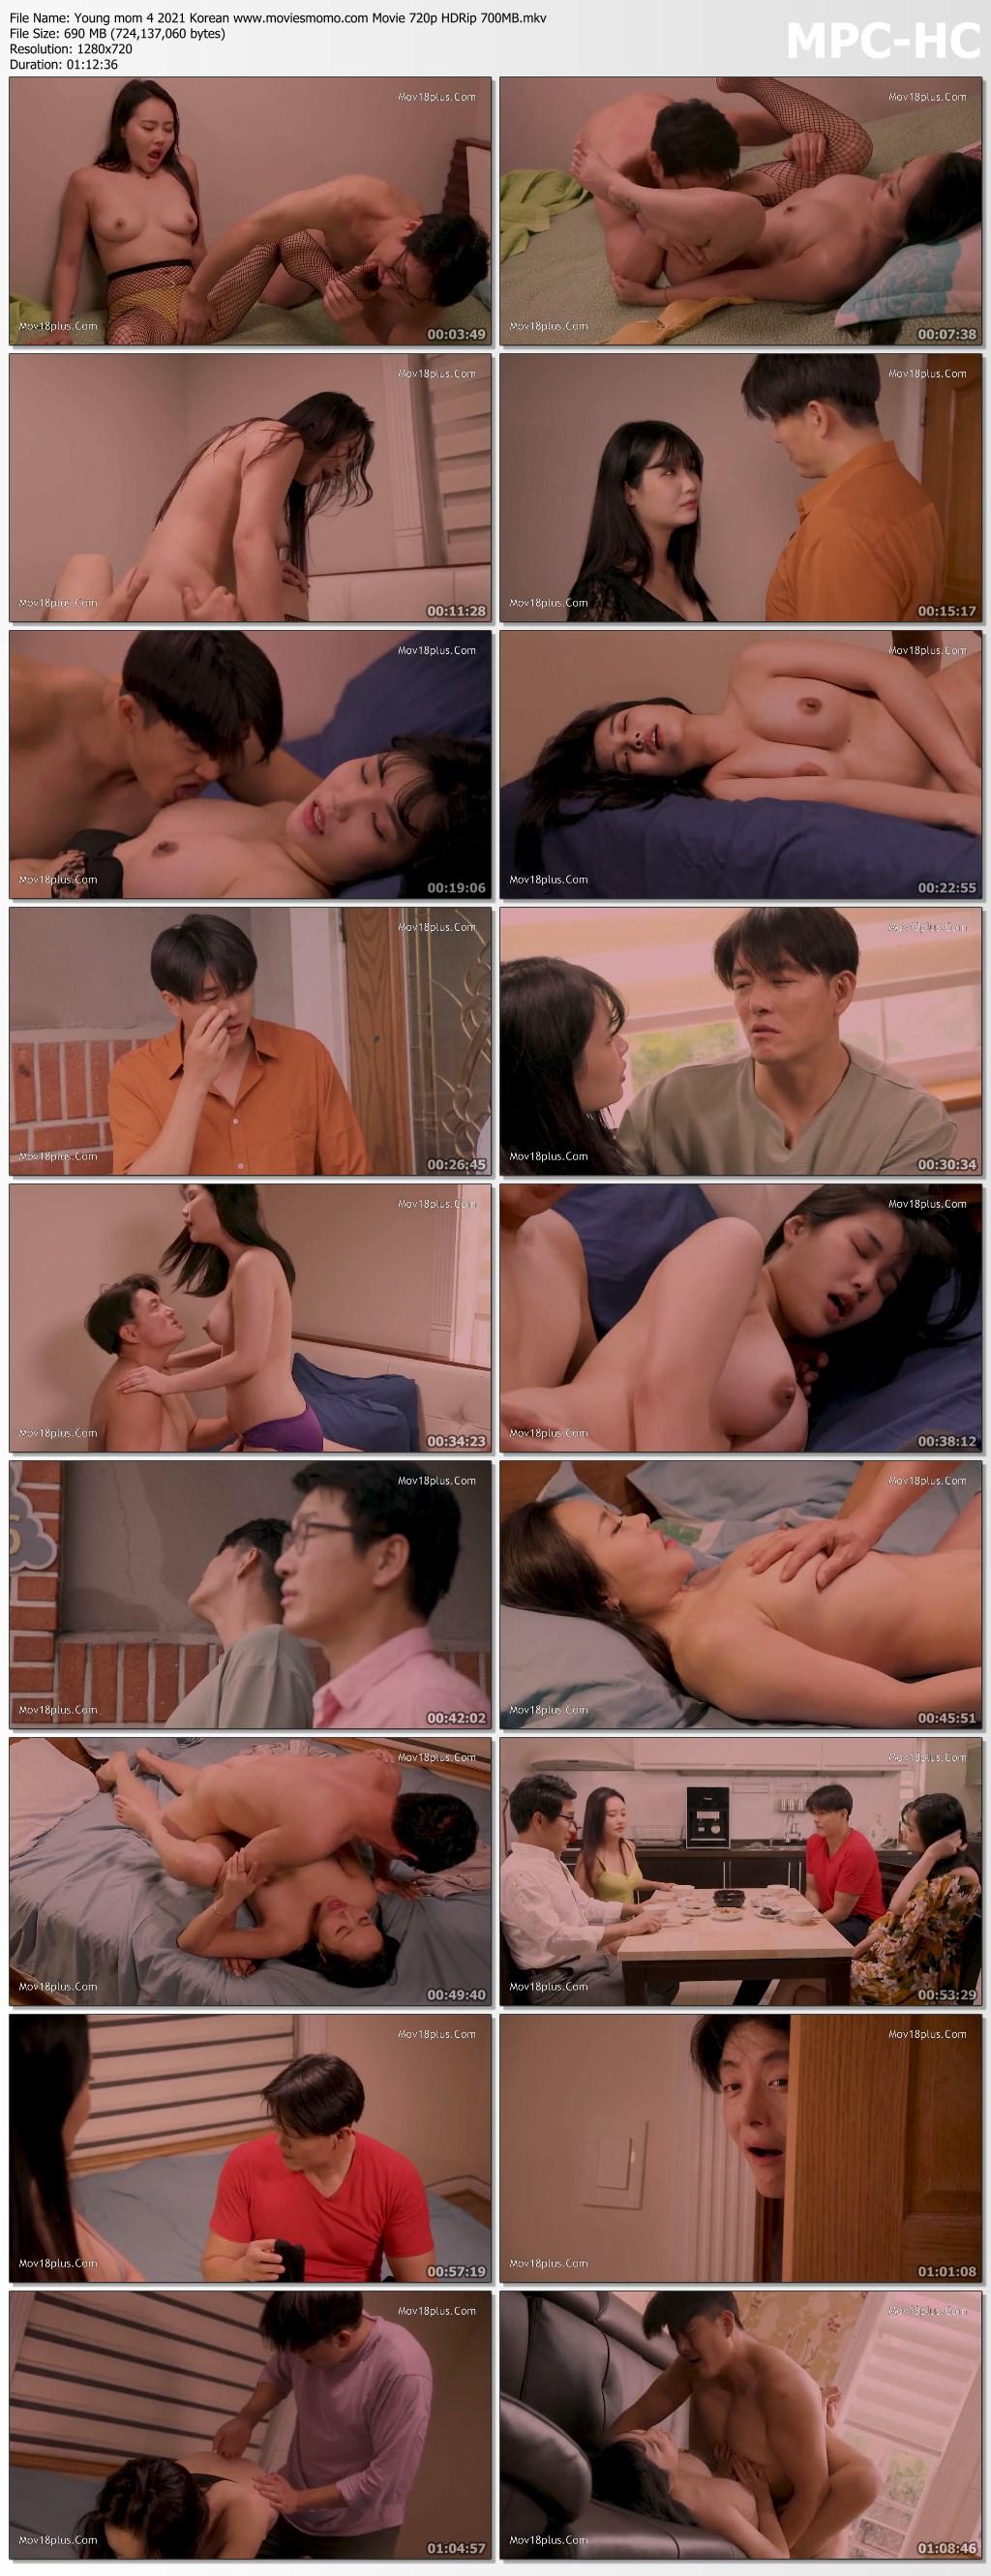 Young mom 4 2021 Korean www.moviesmomo.com Movie 720p HDRip 700MB.mkv thumbs - 18+ Young mom 4 2021 Korean Movie 720p HDRip 700MB x264 AAC